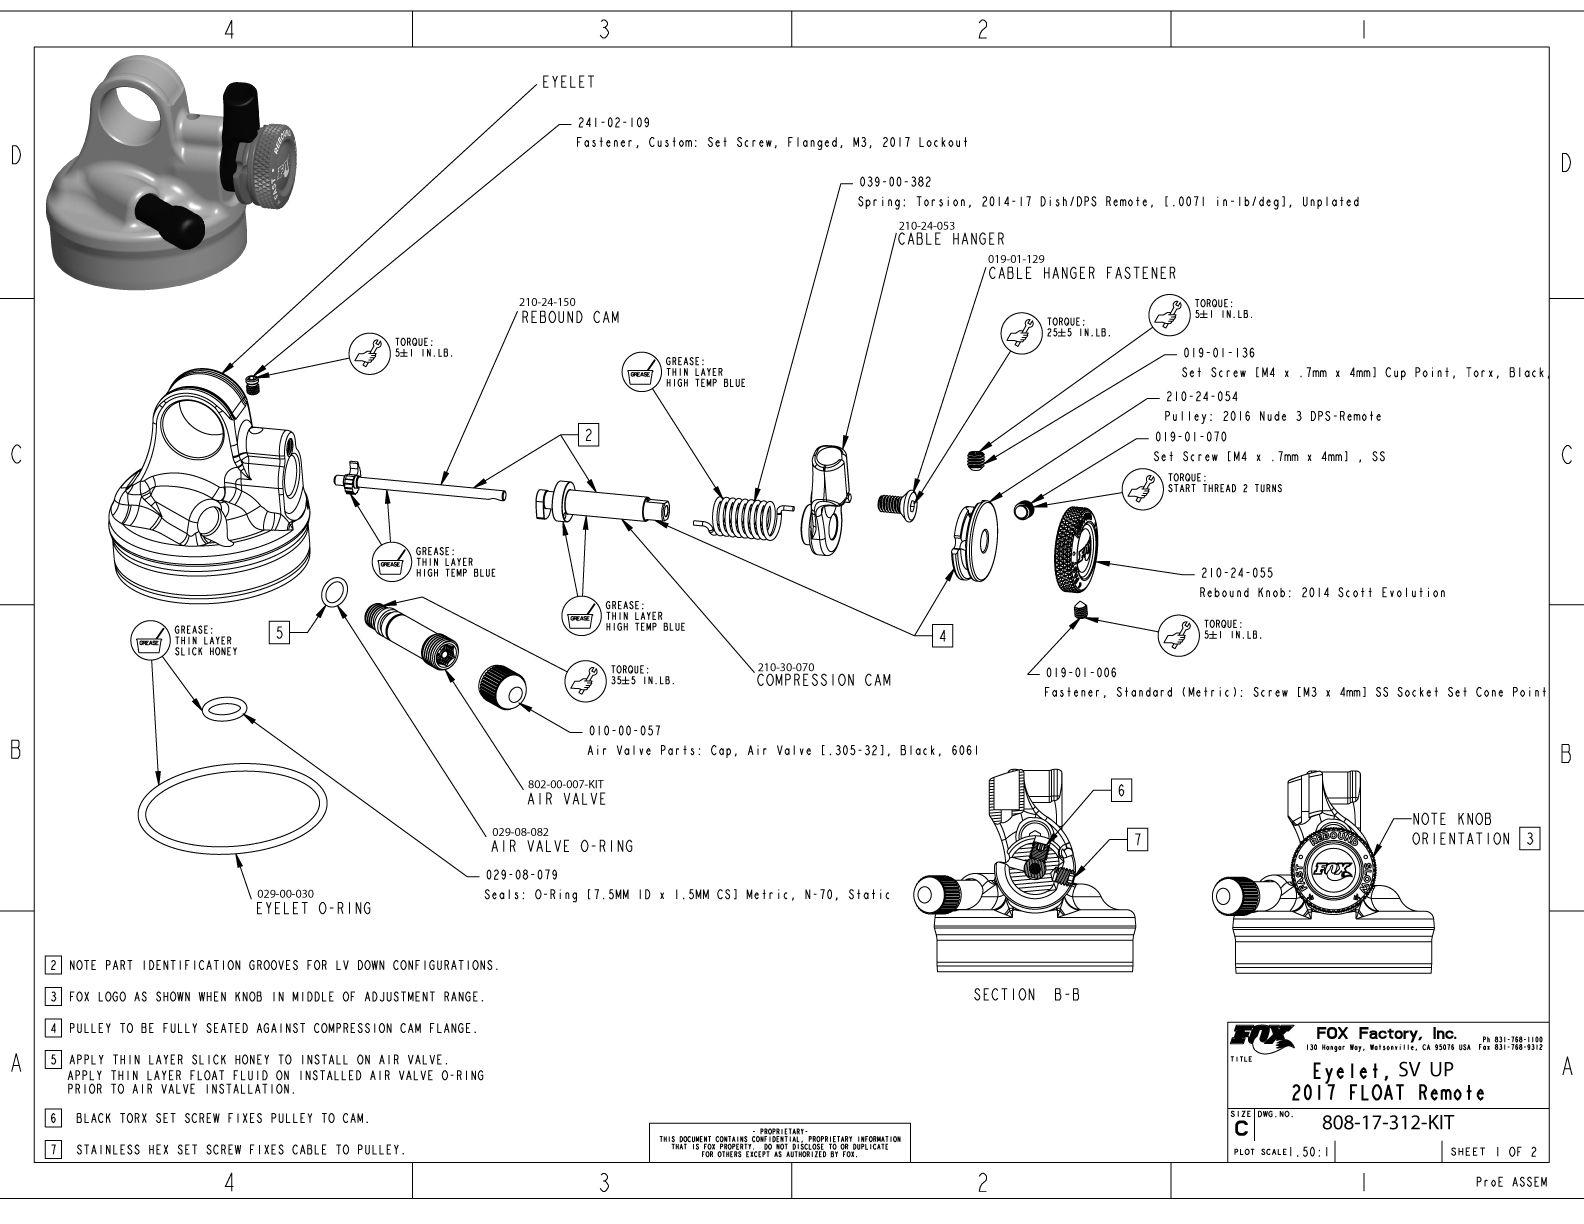 Dps 500 Manual Atx Smps Circuit Schematic Dna1005a Neocortec A S Array Float Part Information Bike Help Center Fox Rh Ridefox Com